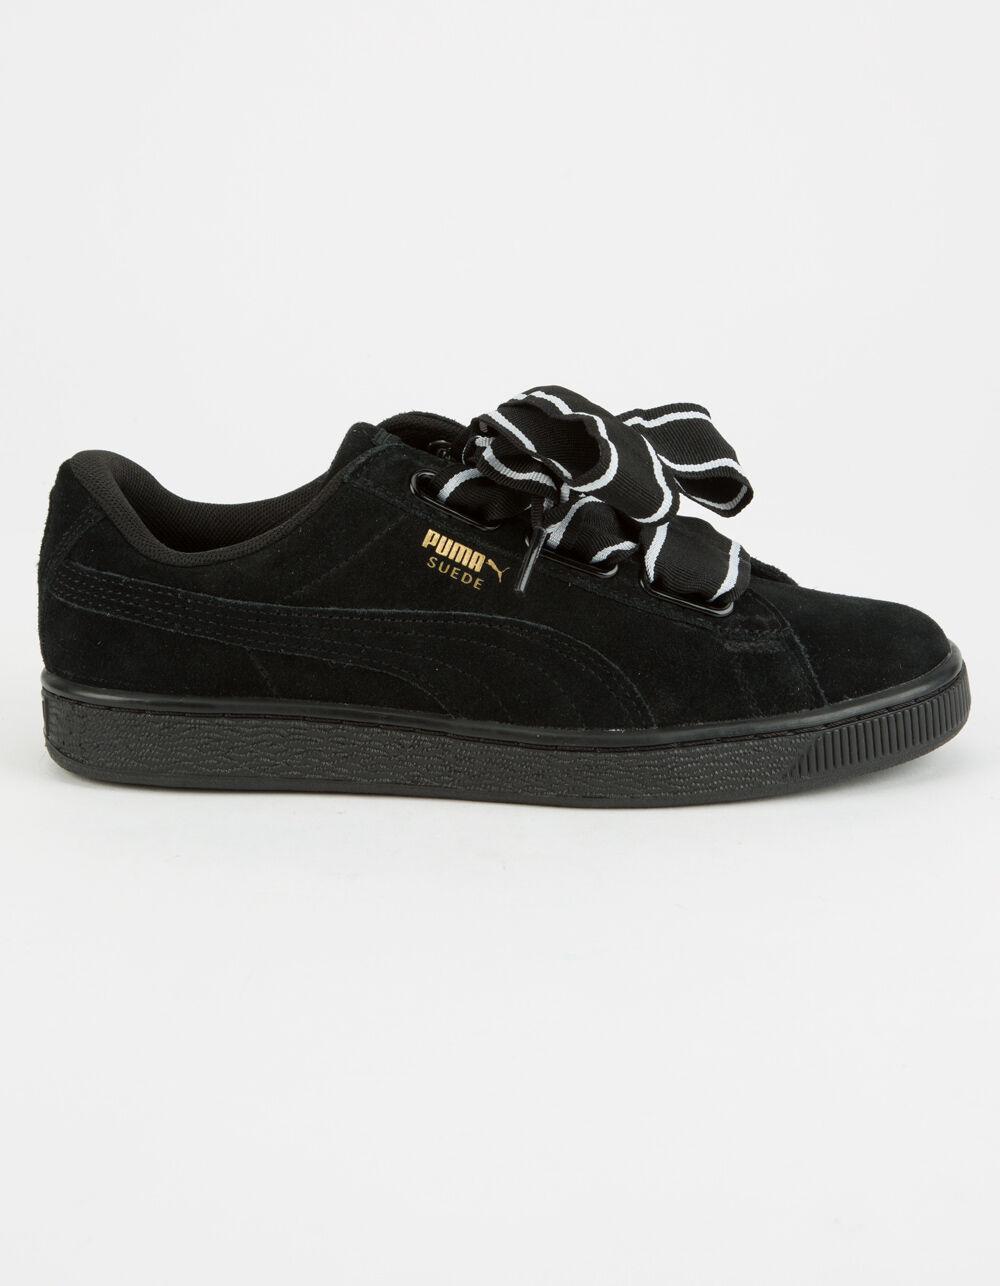 PUMA Suede Heart Satin Shoes